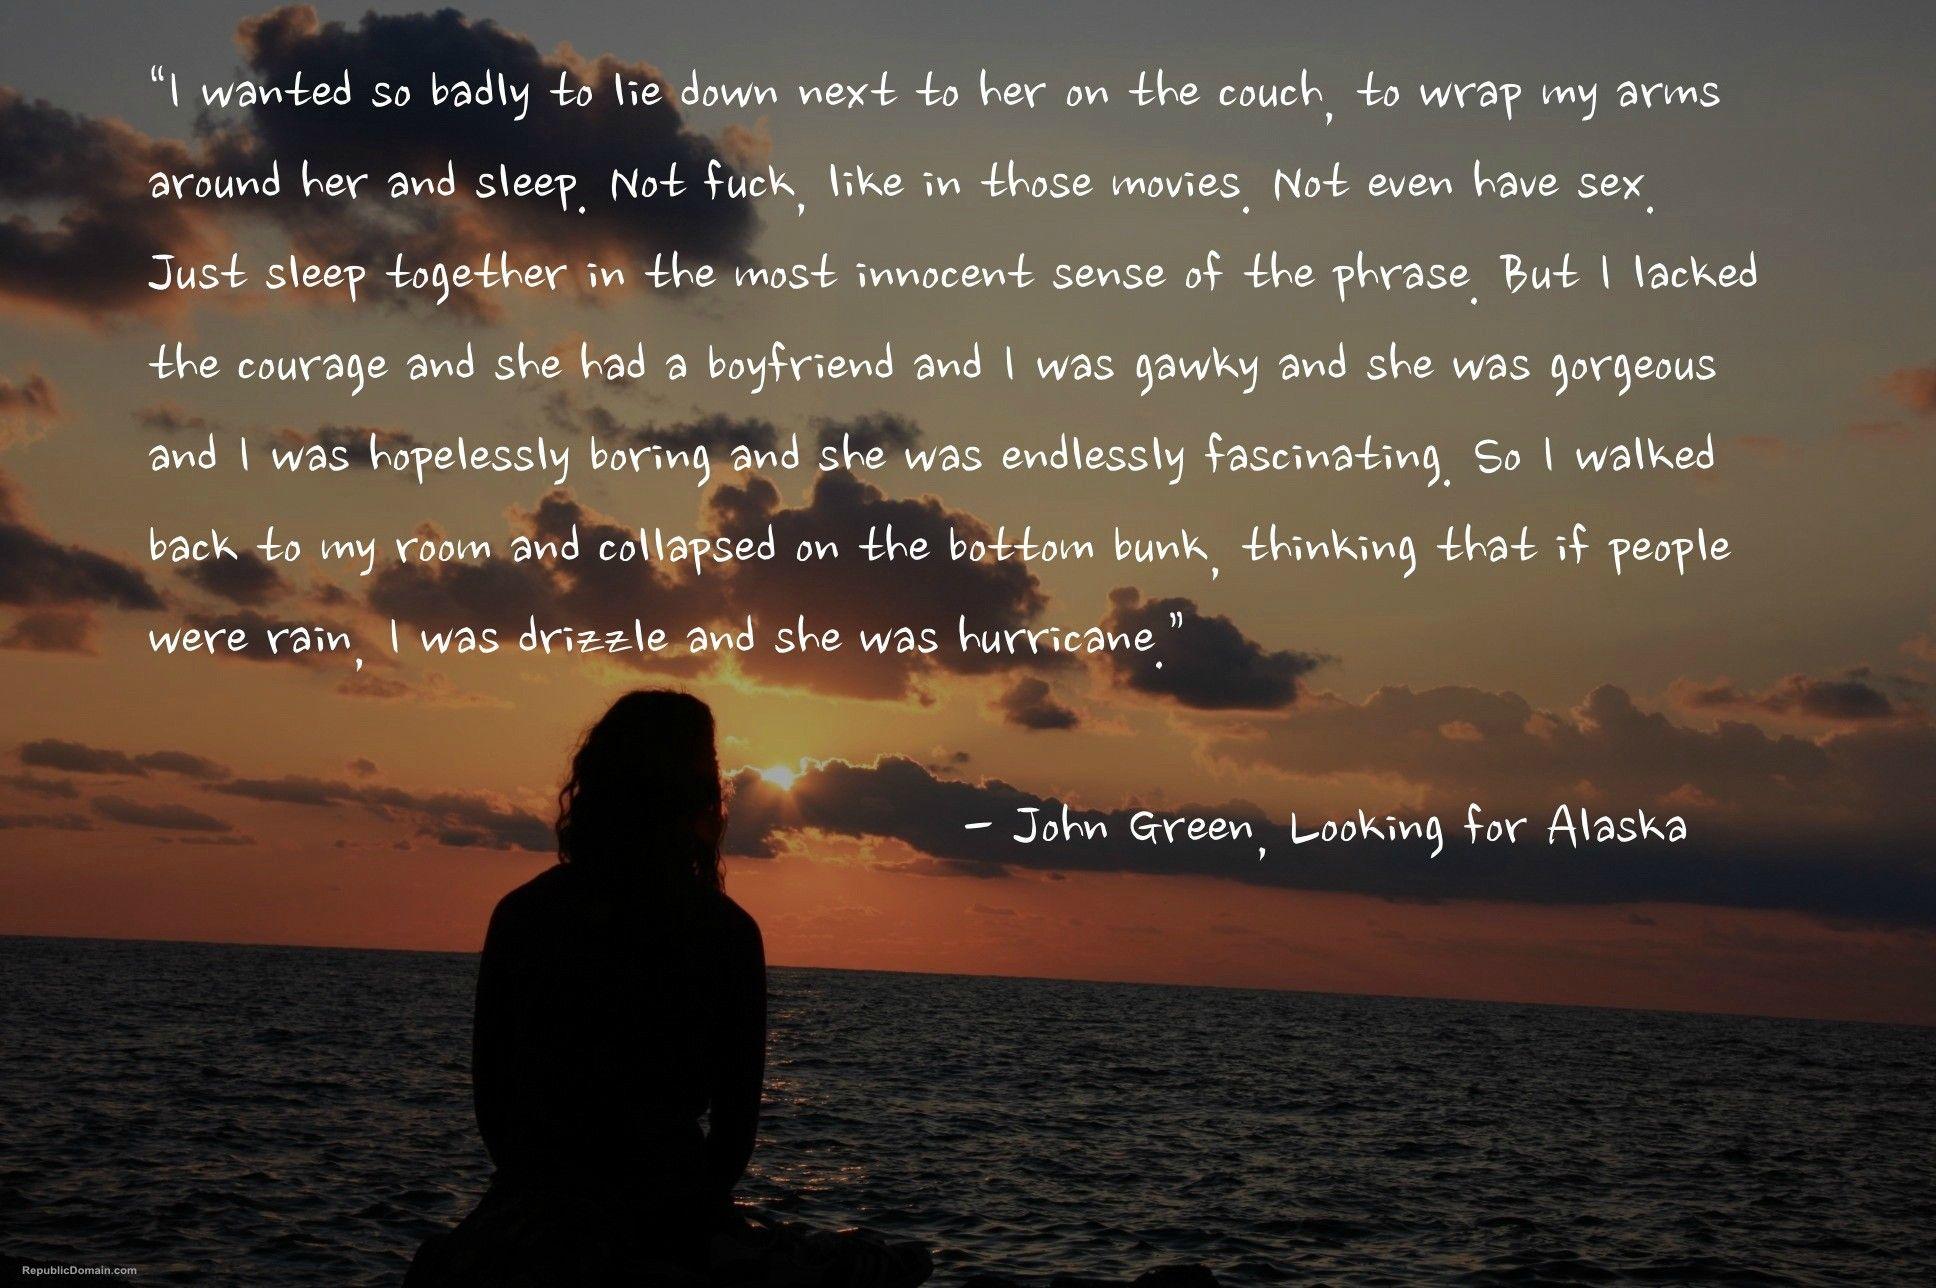 John Green Hurricane Quote People Were Rain I Was Drizzle And She Was A Hurricane John Green Best Quotes Hurricane Quotes Enjoy Quotes